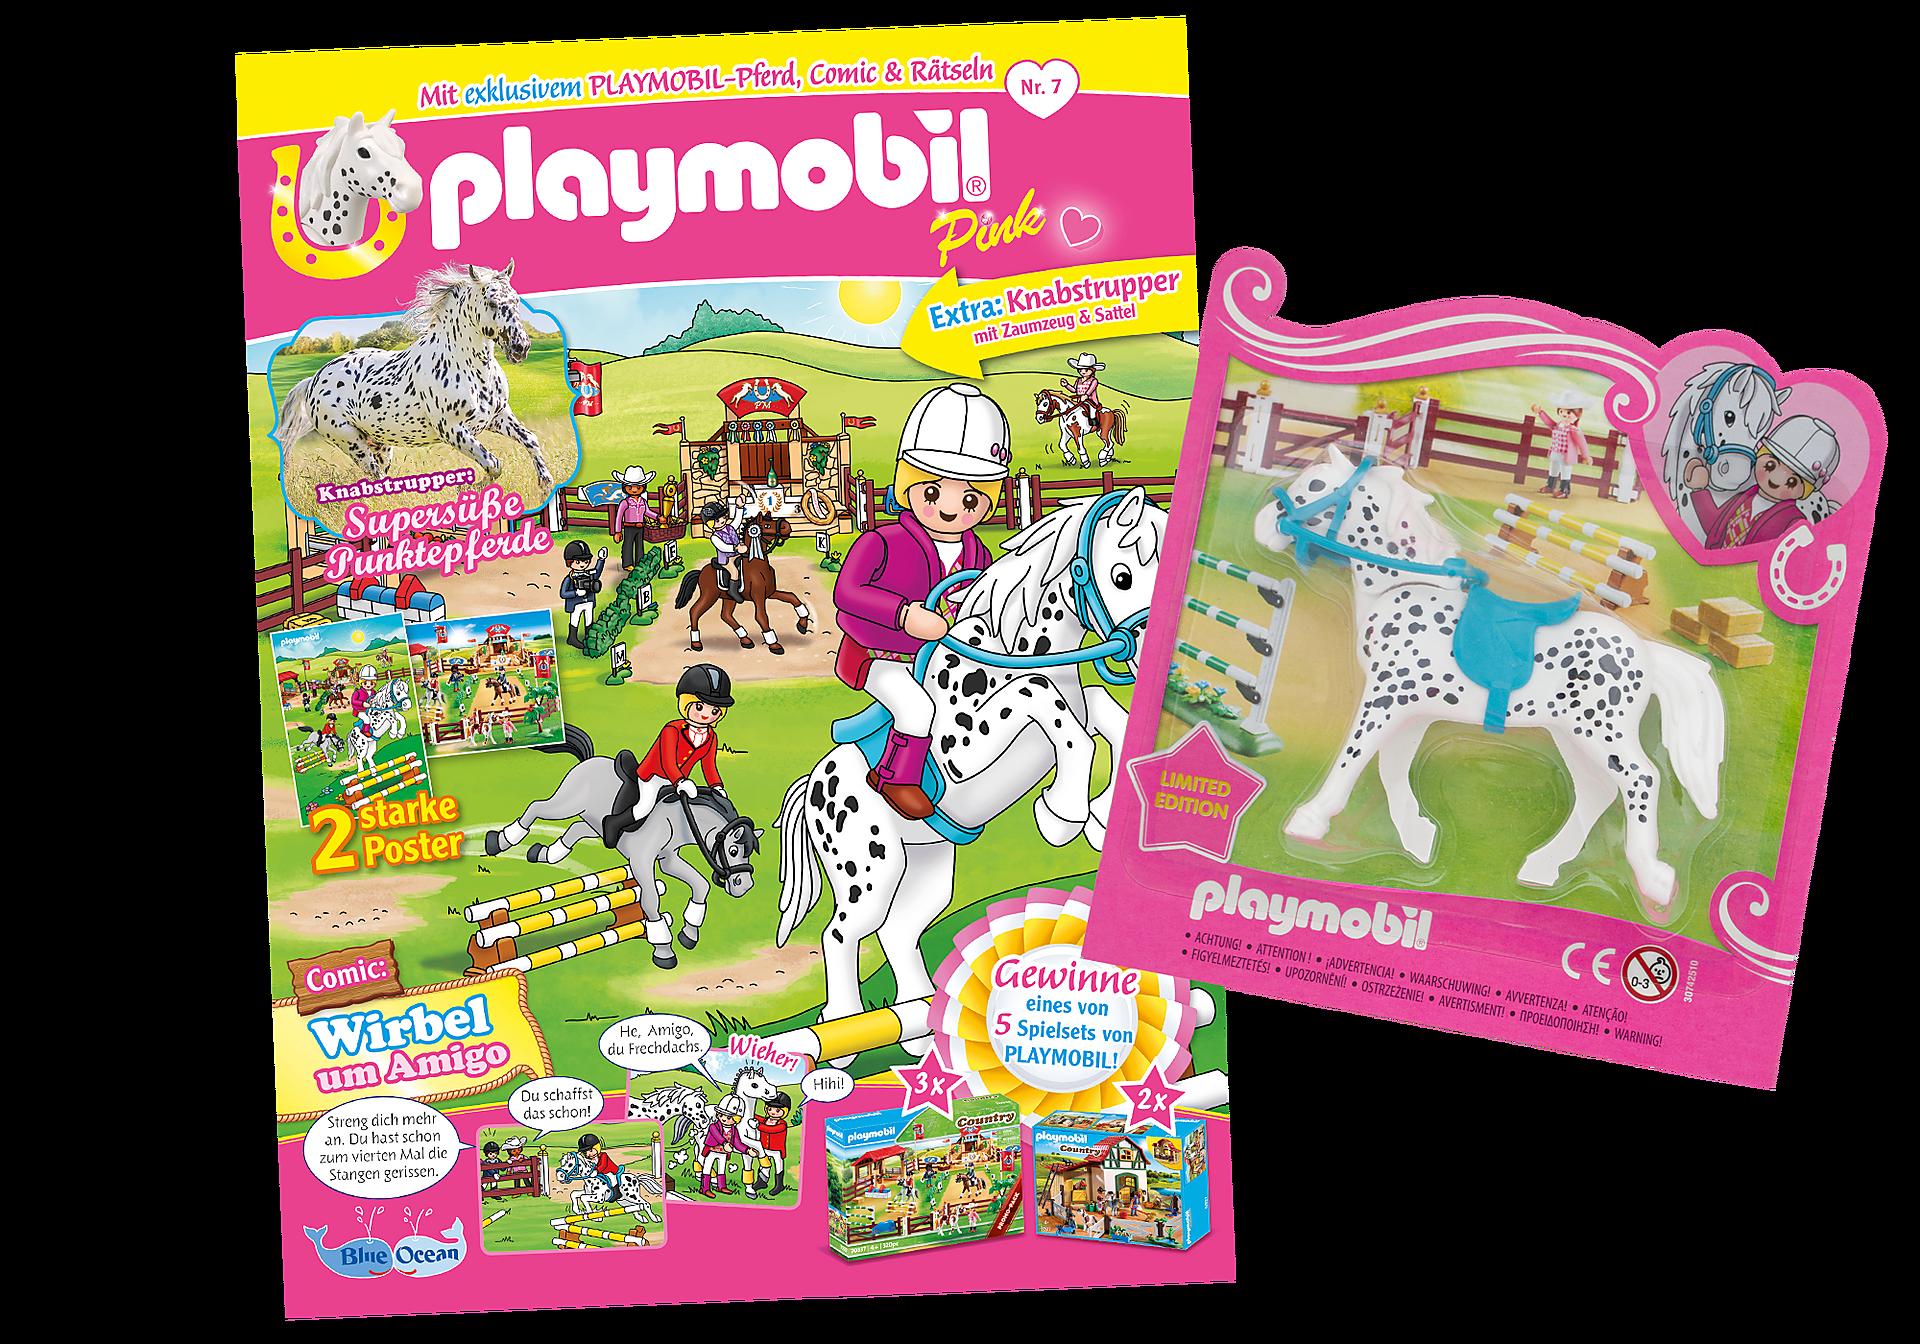 80668 PLAYMOBIL-Magazin Pink 7/2020 (Heft 56) zoom image1